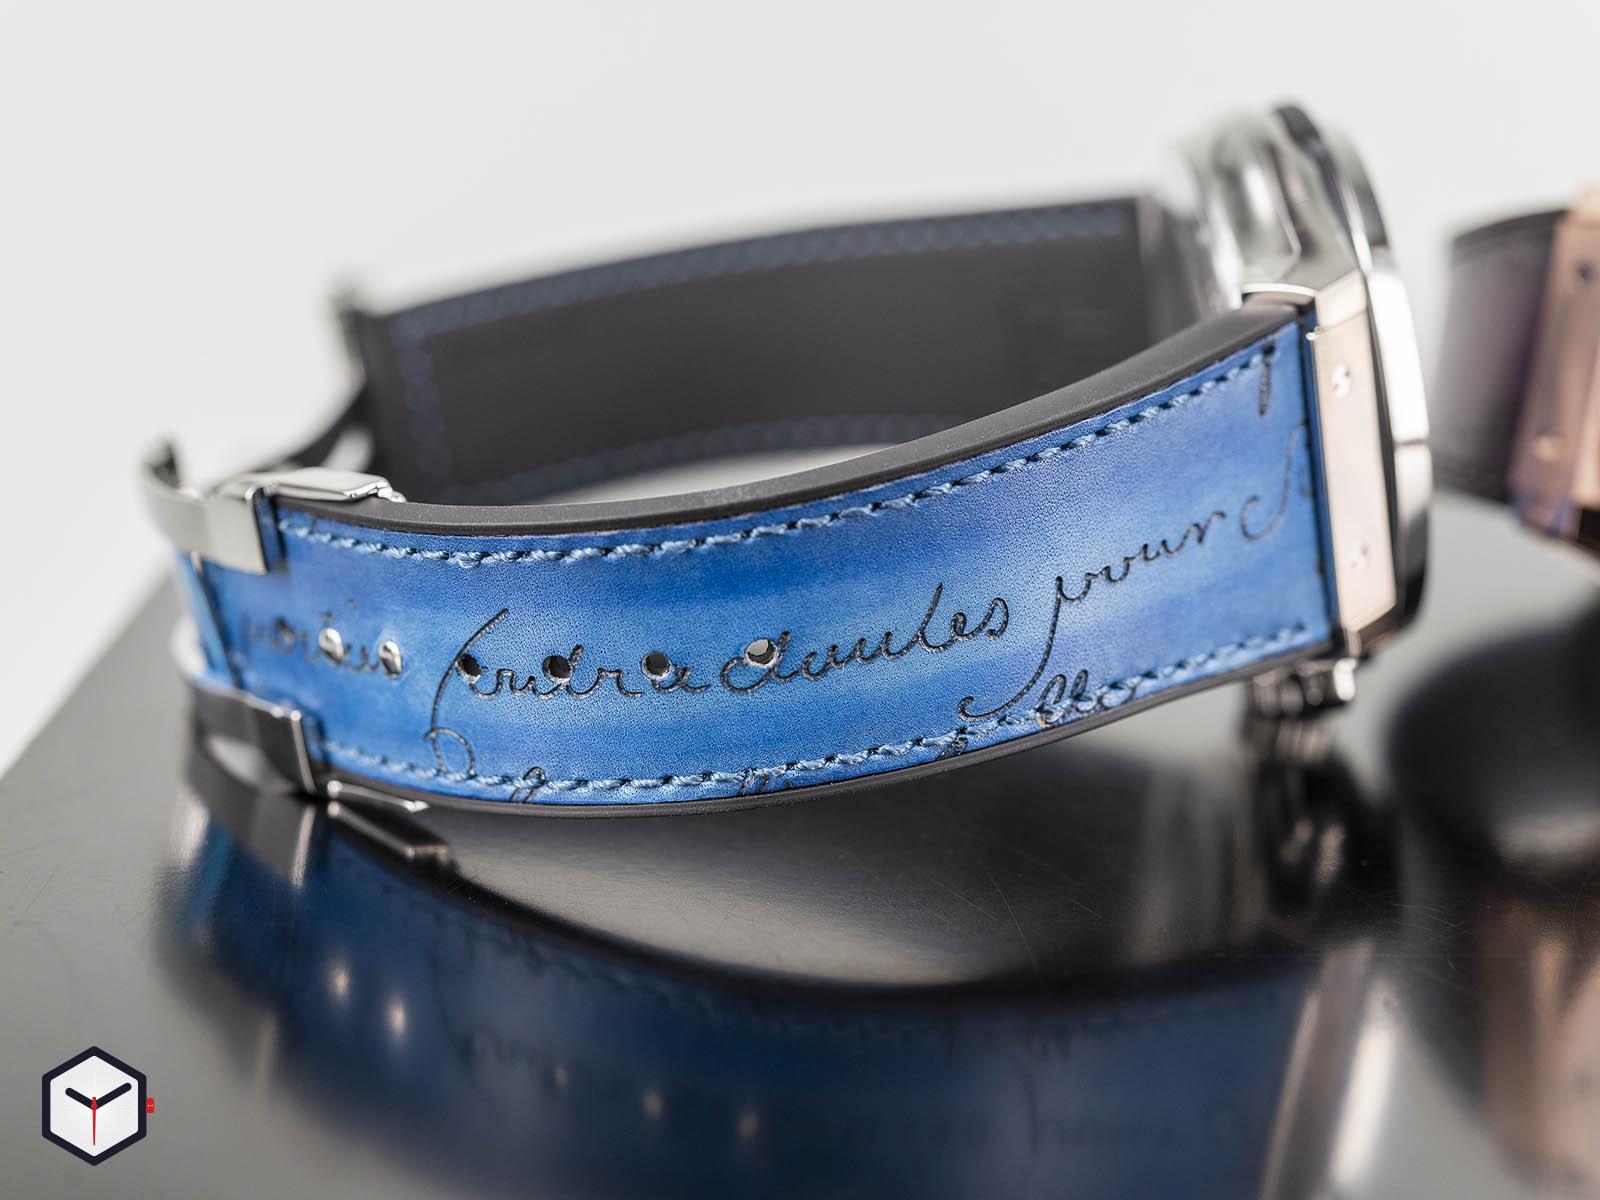 521-nx-050b-vr-ber18-hublot-classic-fusion-chronograph-berluti-scritto-ocean-blue-45mm-7.jpg